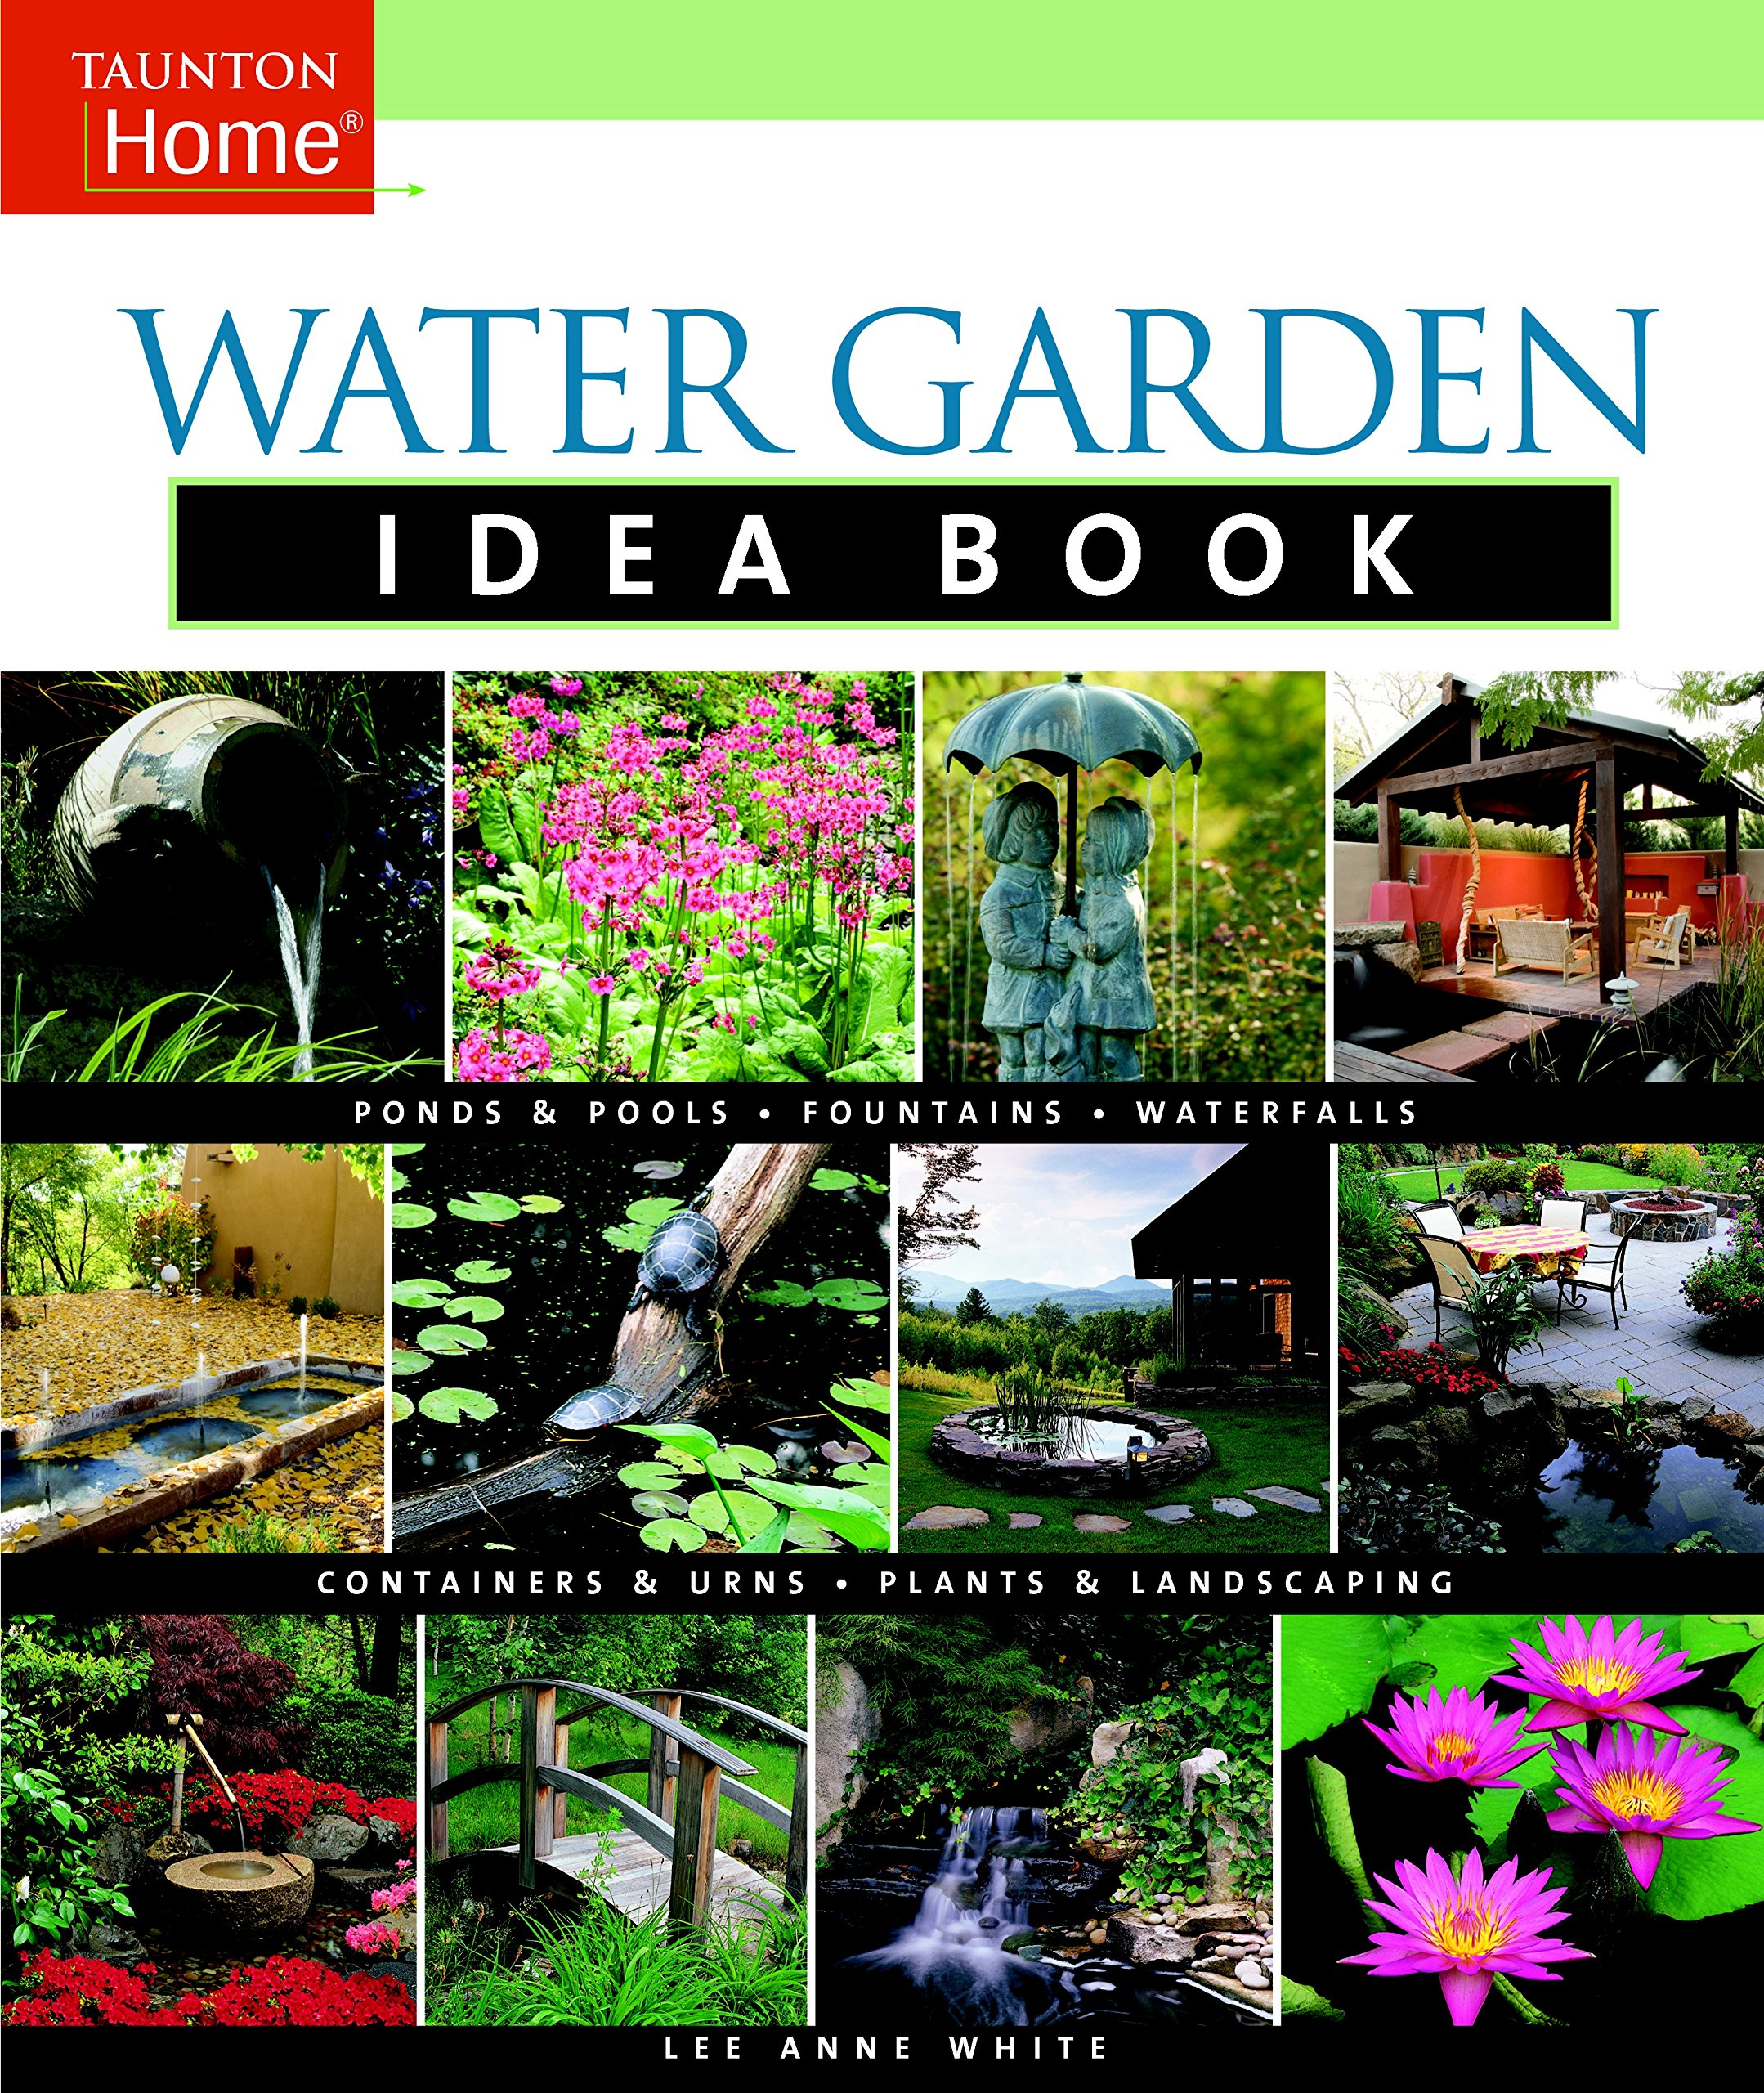 Water Garden Idea Book Taunton Home Idea Books Lee Anne